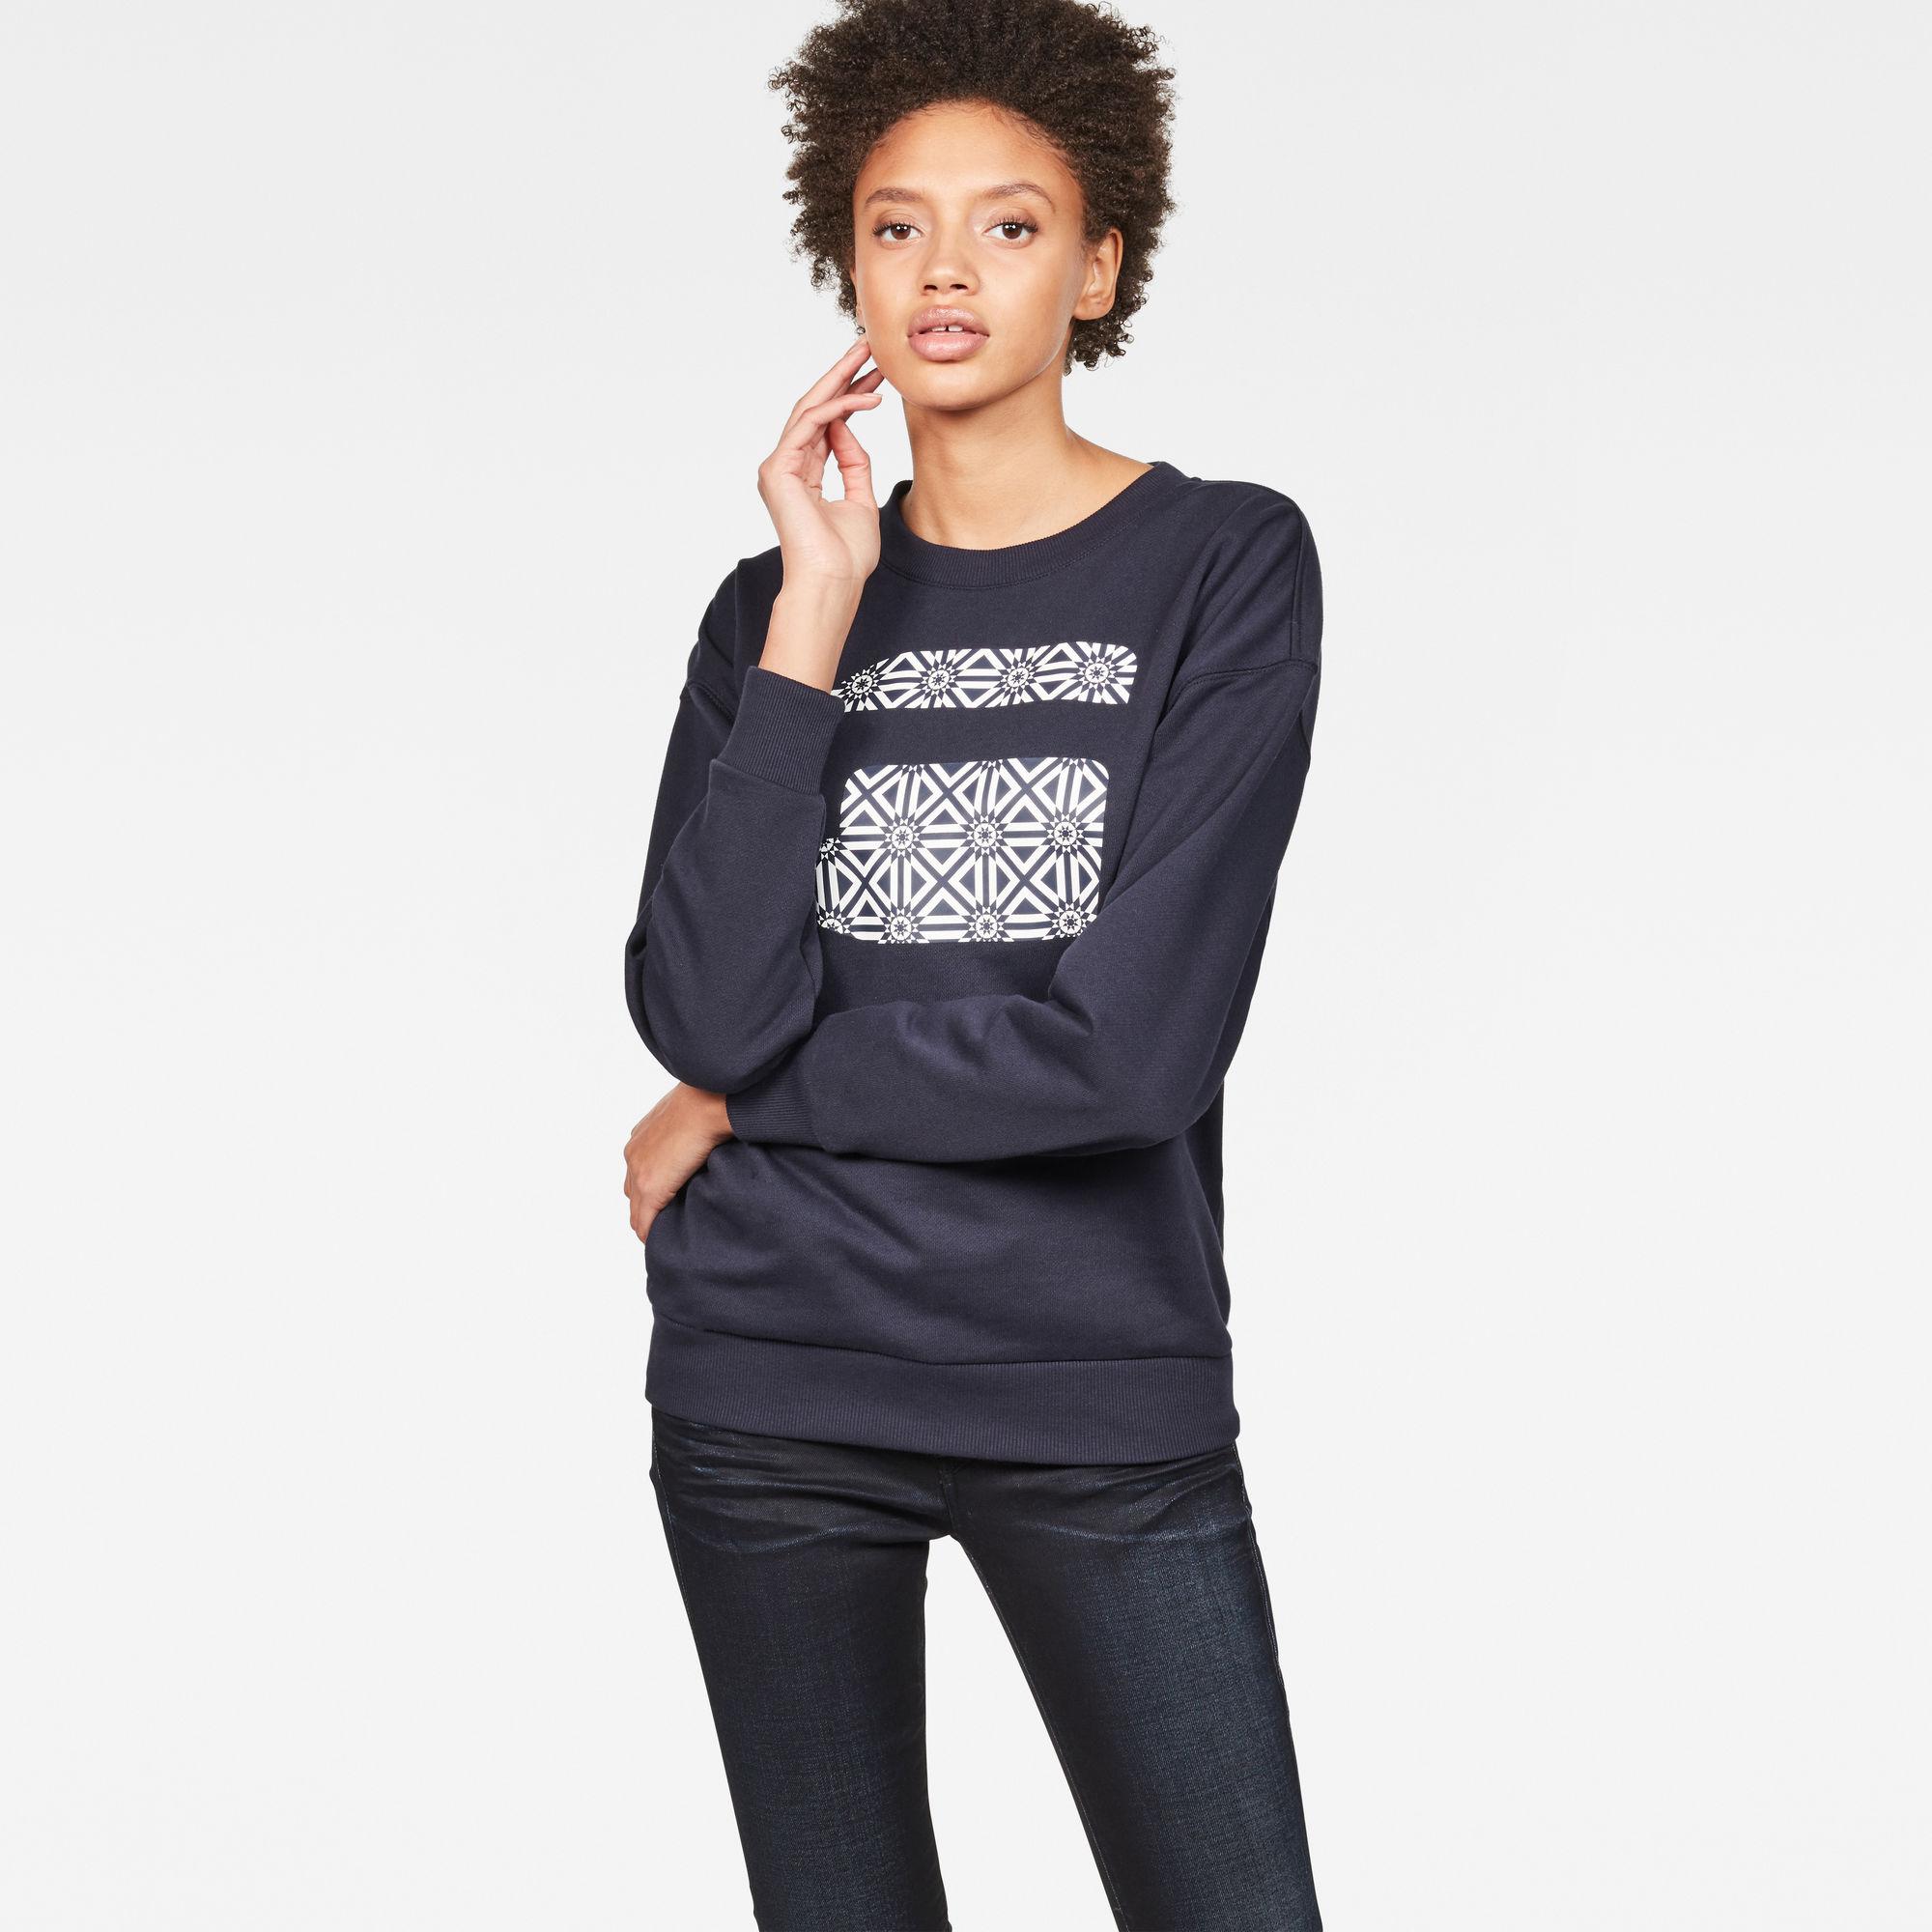 G-Star RAW Dames Oluva Oversized Sweater Donkerblauw